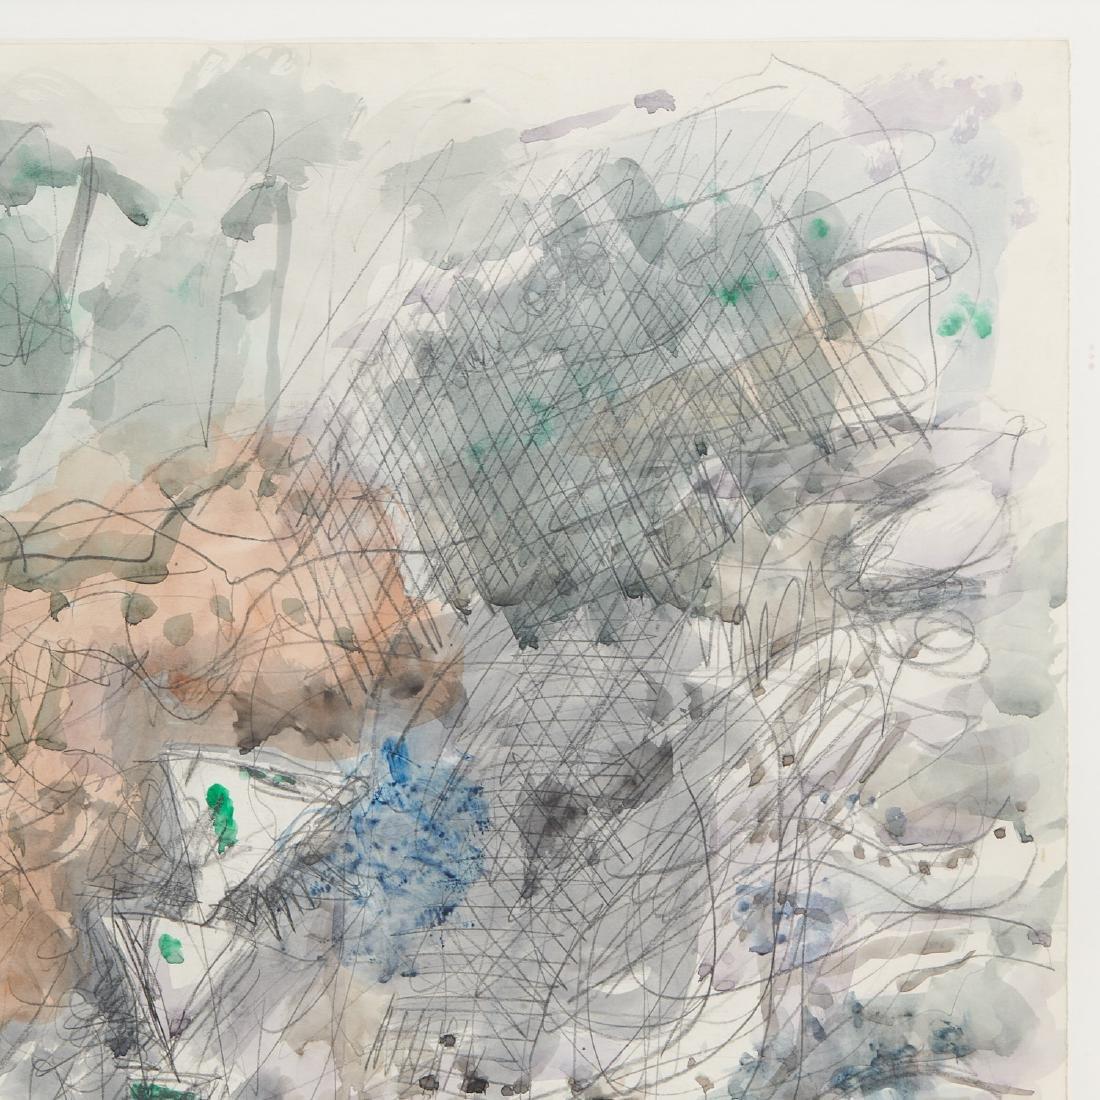 Avigdor Stematzky, Abstract Landscape, 1980 - 2